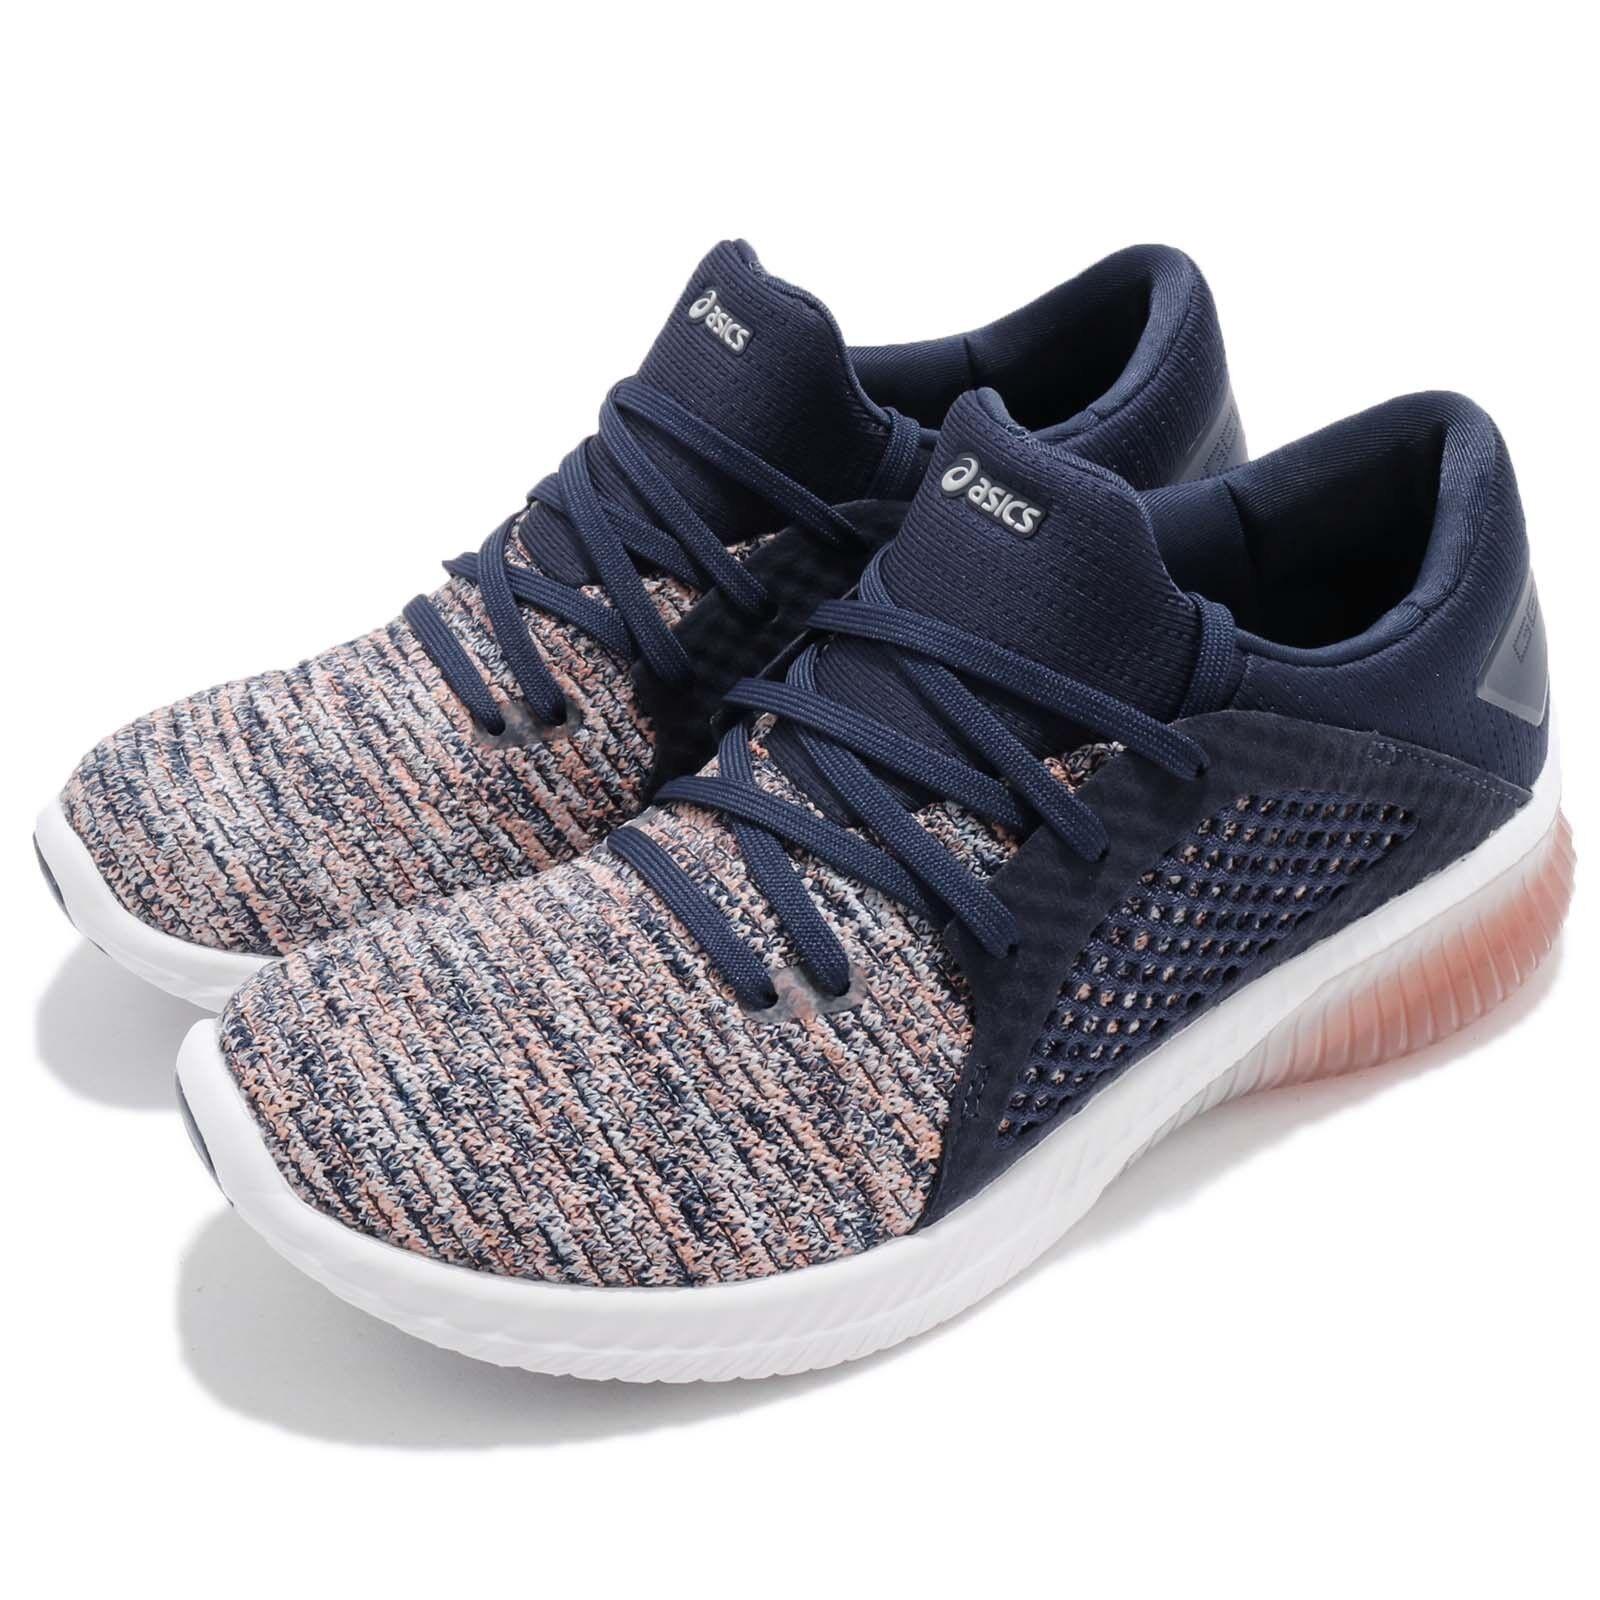 Asics Gel-Kenun Knit Rose Bleu Blanc Women Running Chaussure Baskets T882N-0649